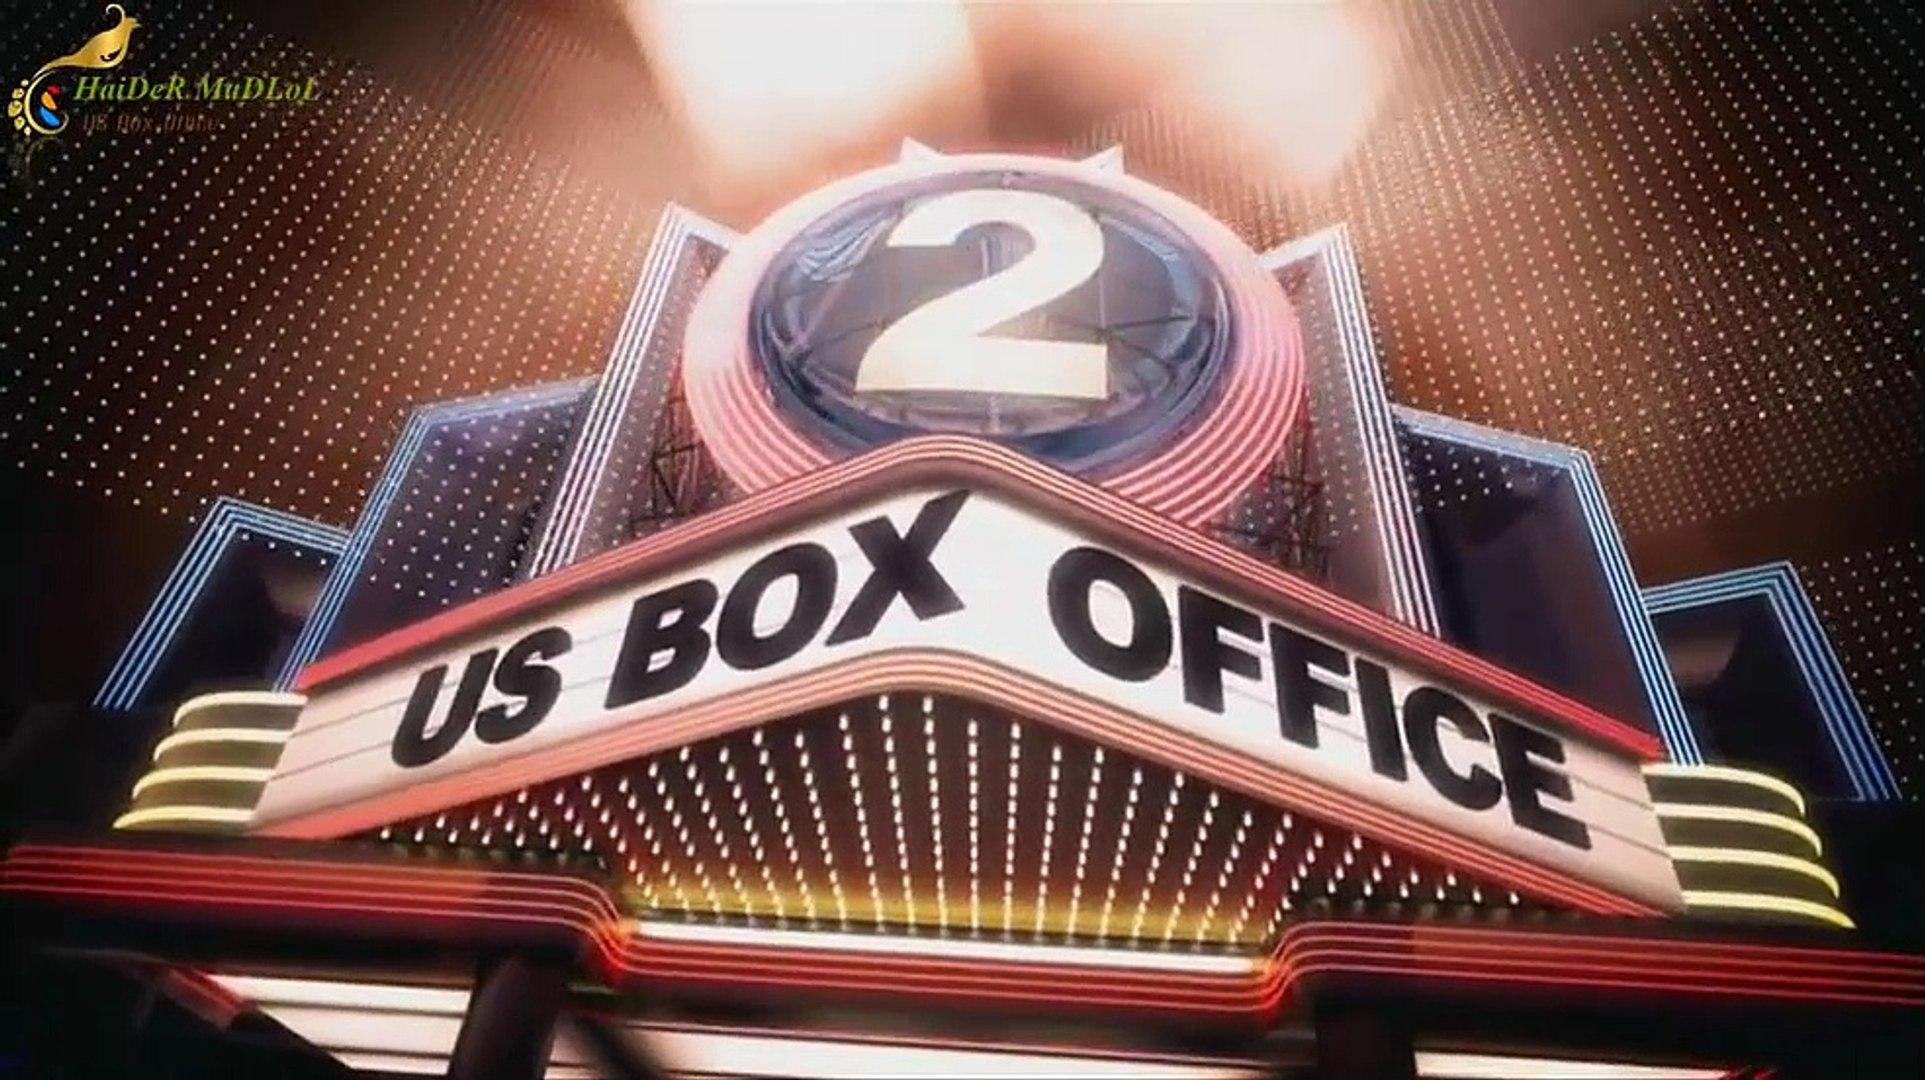 Underworld: Blood Wars (2016) Full Movie, Streaming, Download, Best Quality HD